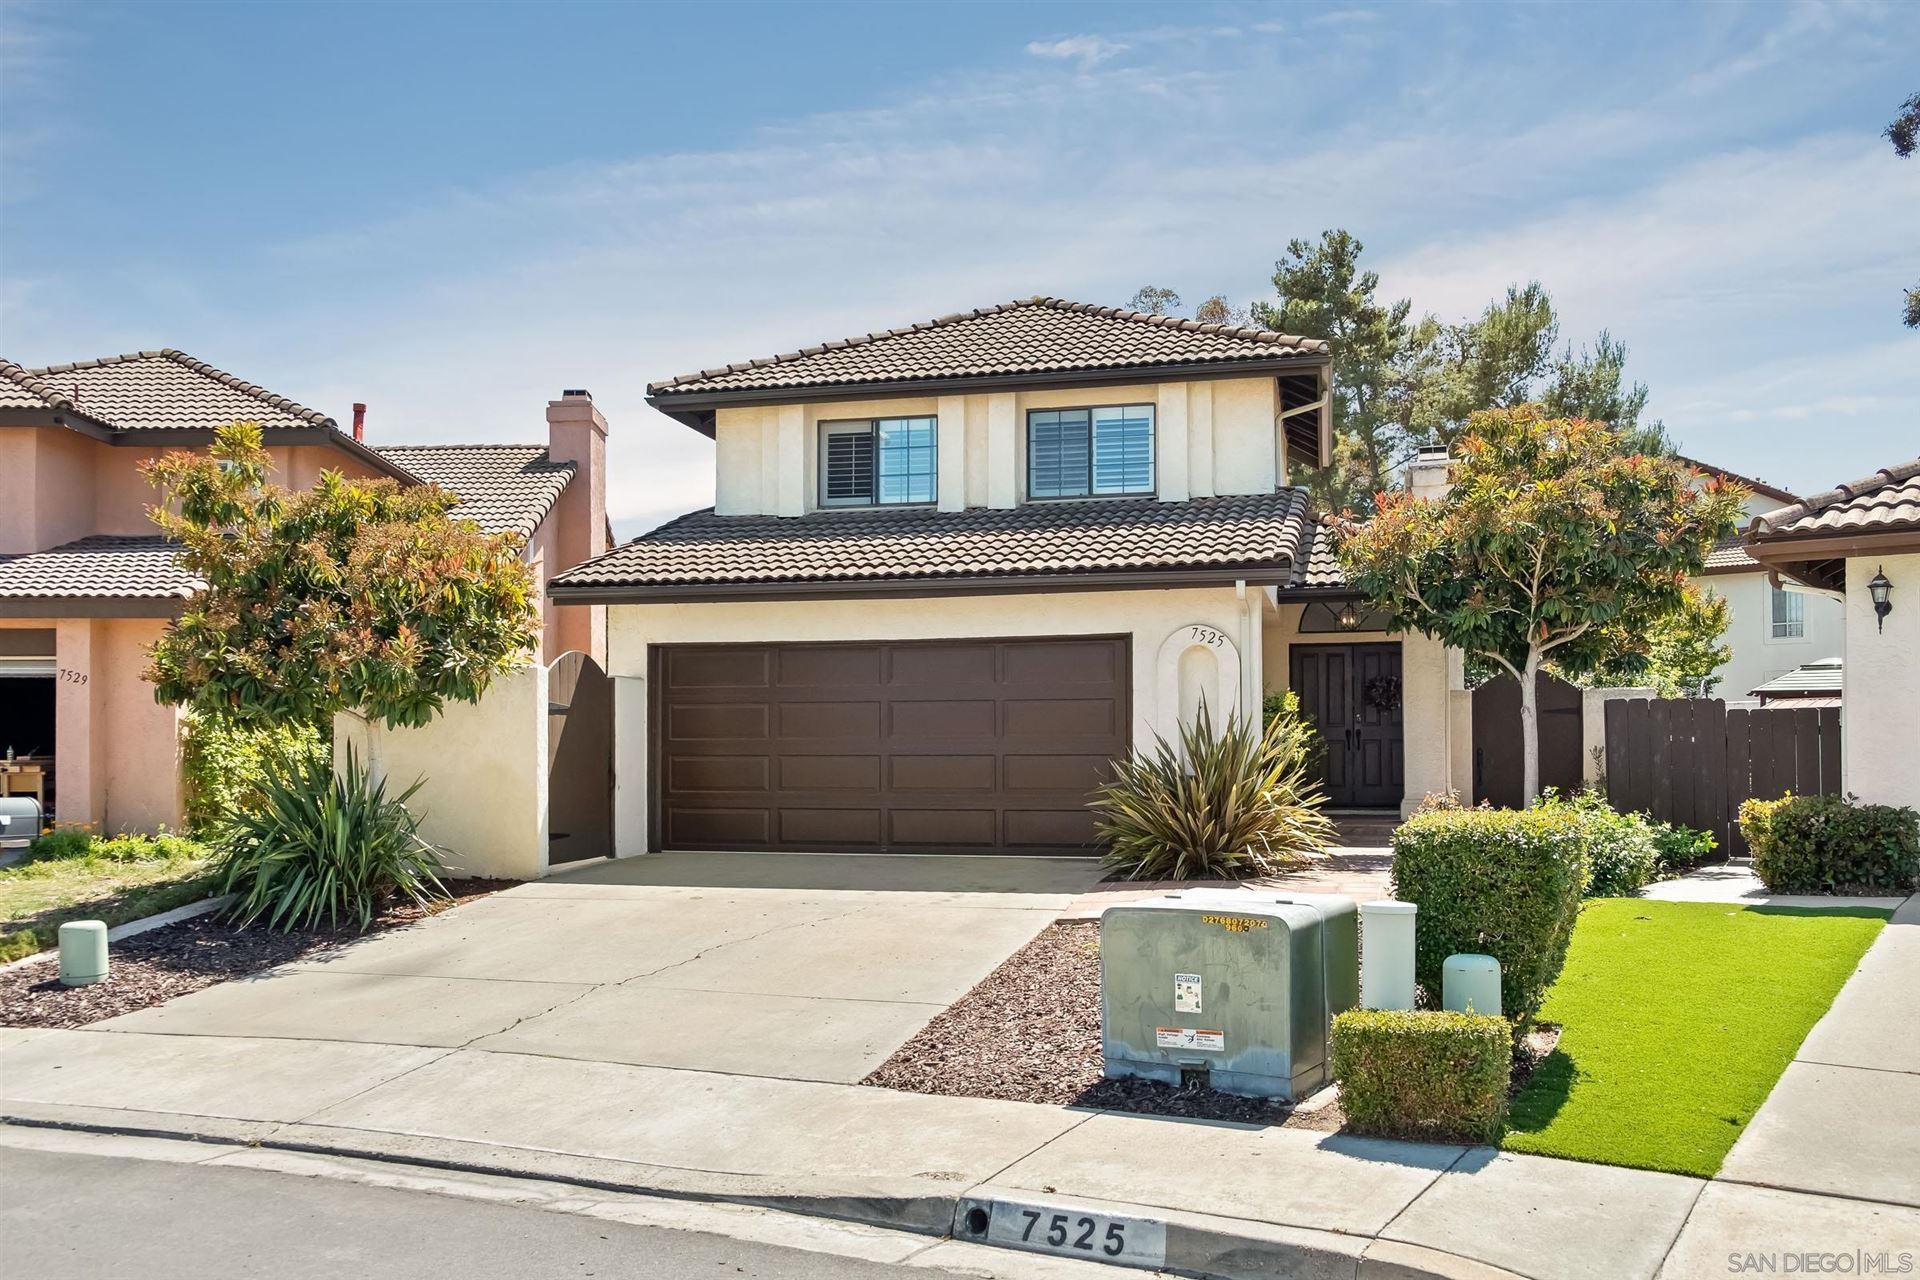 Photo of 7525 Flower Meadow Dr, San Diego, CA 92126 (MLS # 210029727)